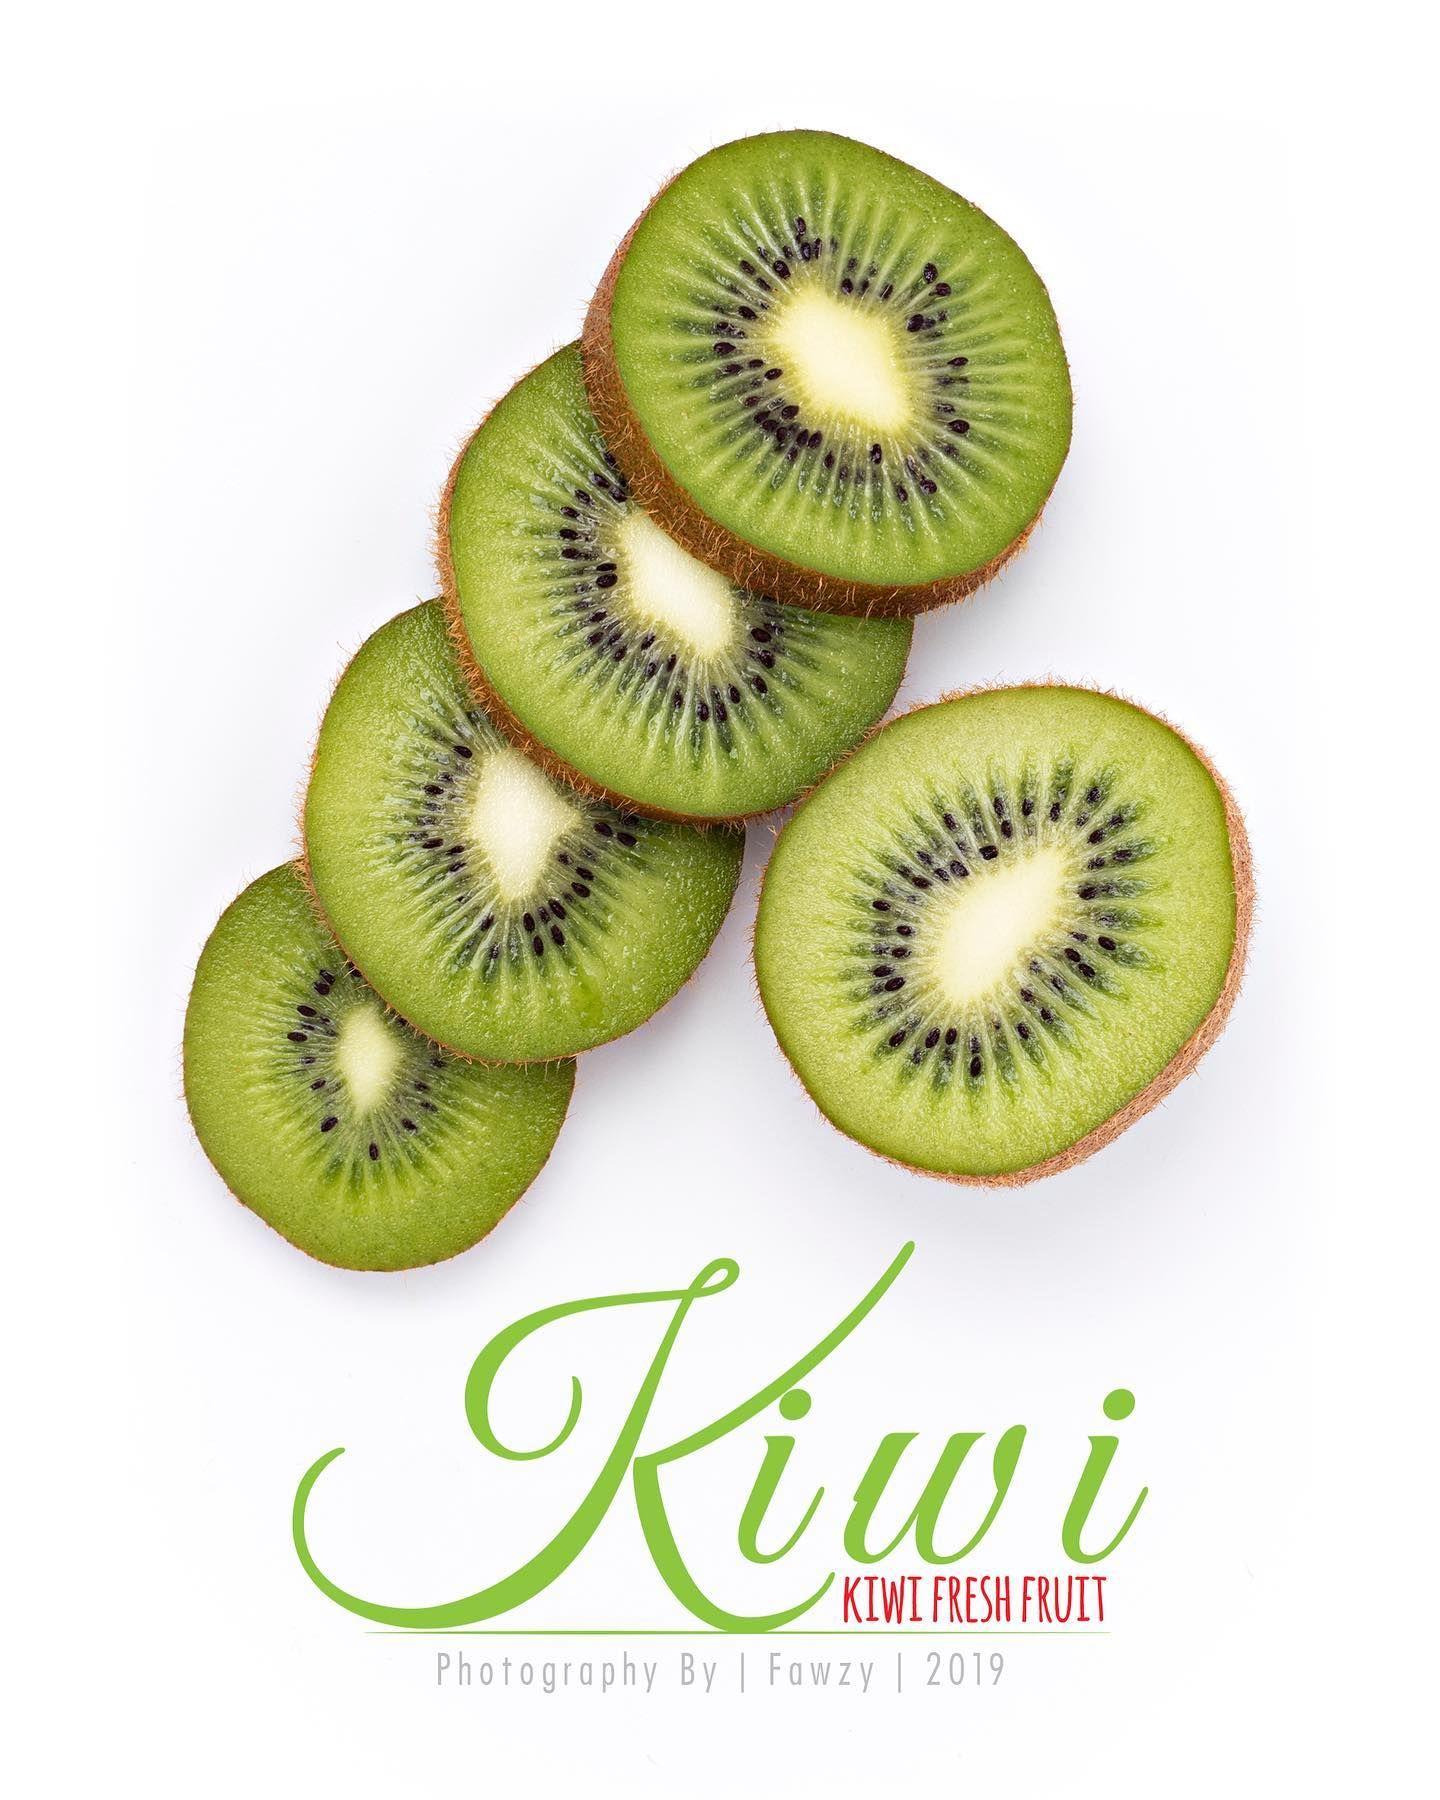 فيتامين تانى مساكم فيتامين نجاح Kiwi Avocado Fruits Fruity Fruitsalad Foodphotography Veganfood Vegan Food Photography Fruit Photography Fresh Fruit